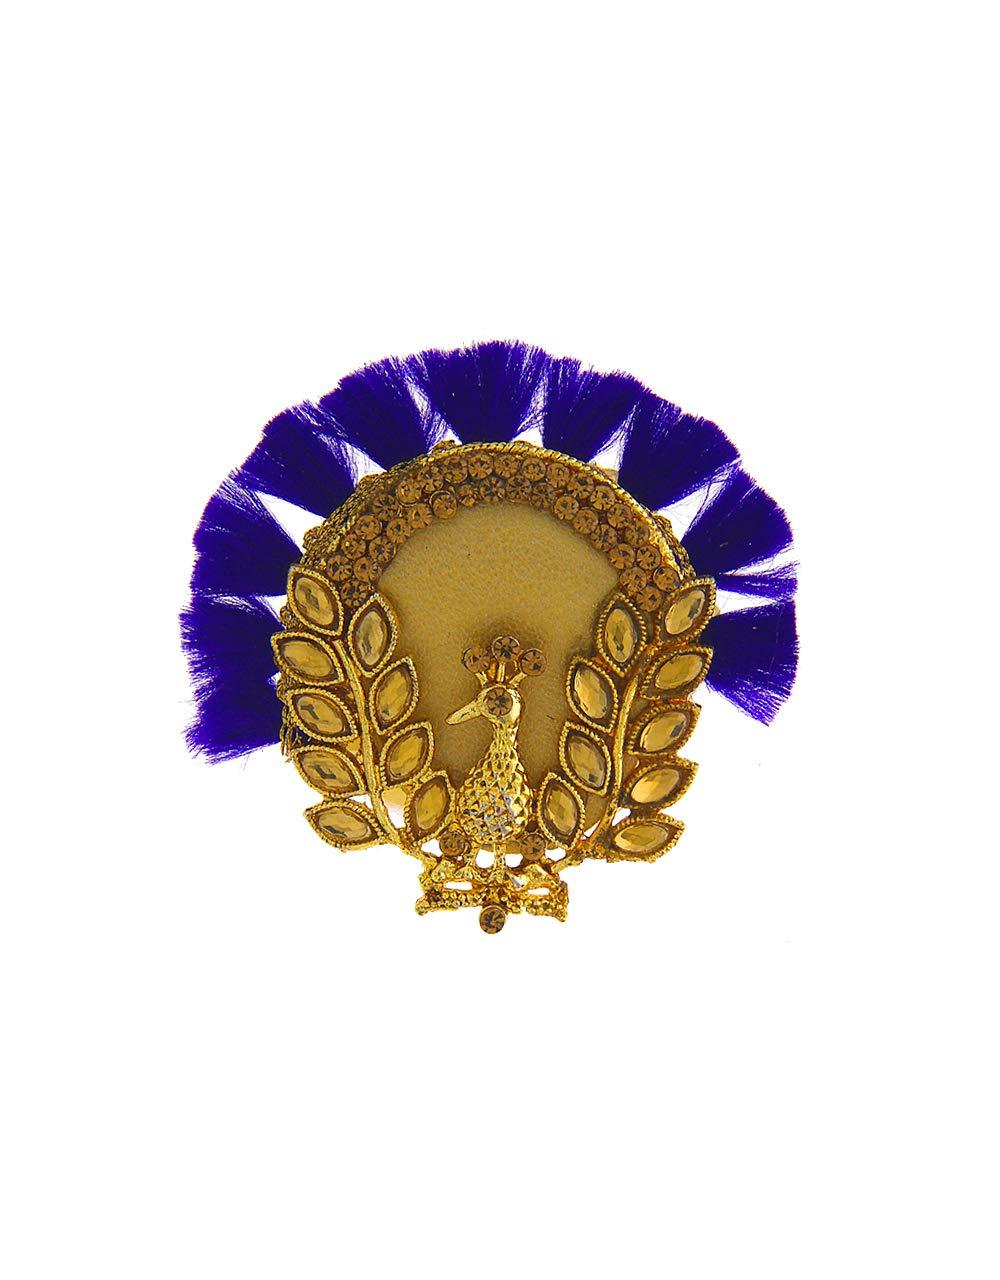 Anuradha Art Blue Colour Peacock Inspired Designer Classy Saree Pin for Women/Girls